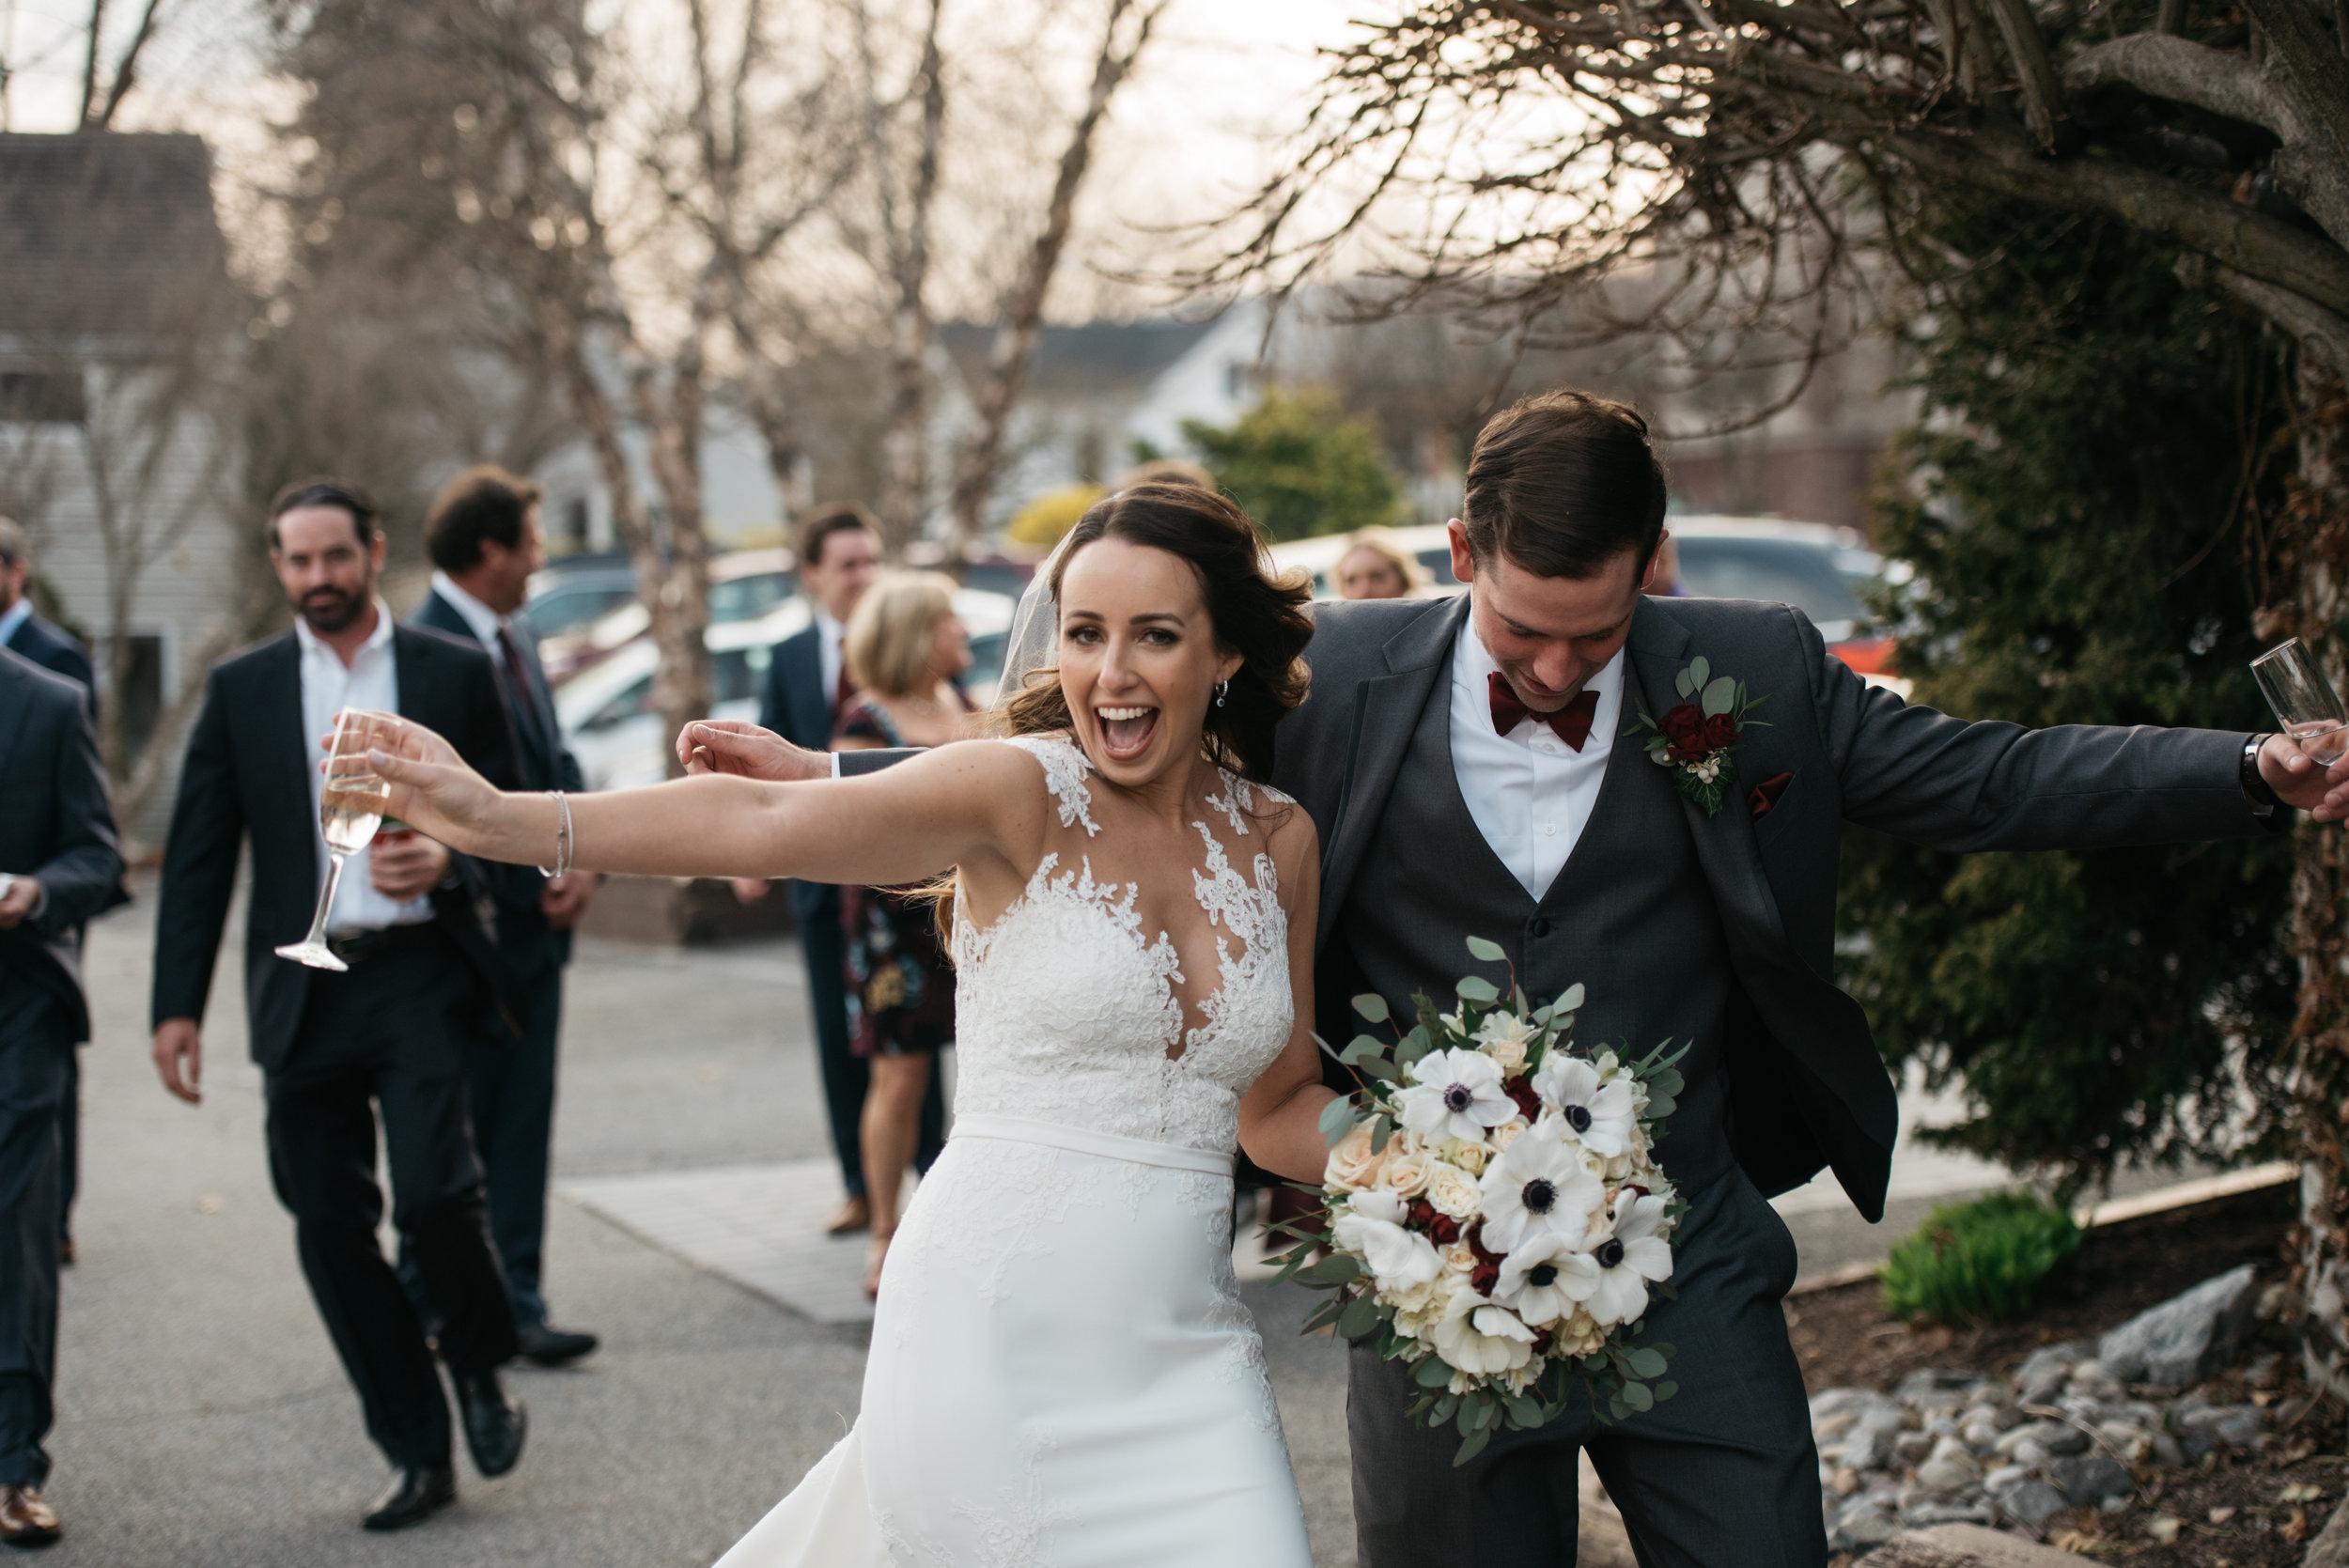 WeddingPhotos | NJPhotographer | Highlights-1-39.jpg